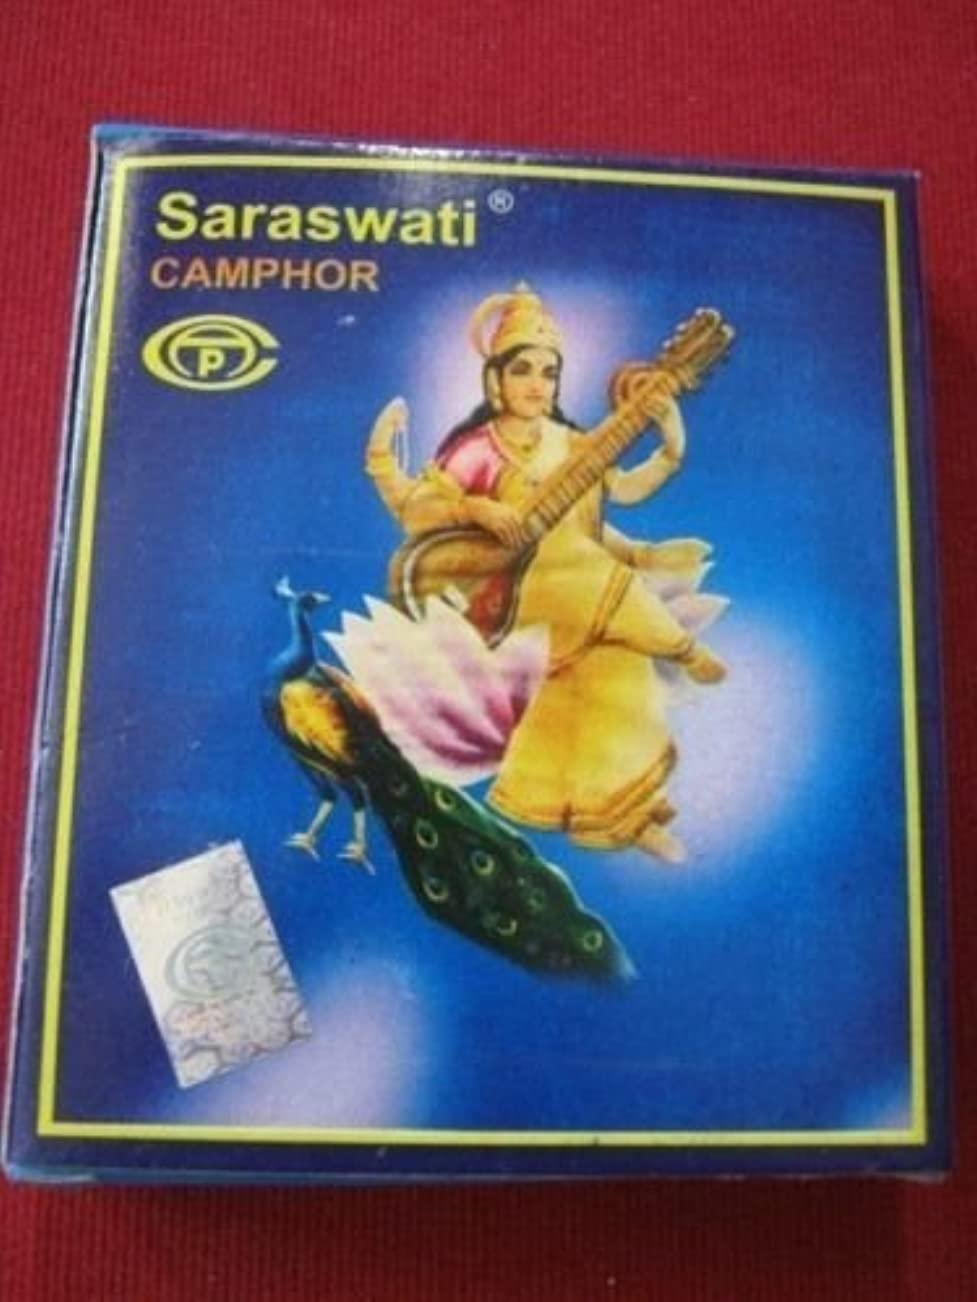 siddratan Buy 2 Get 1 Free Pure Saraswati Camphor Kapur tablets100 tabletsin 1パック